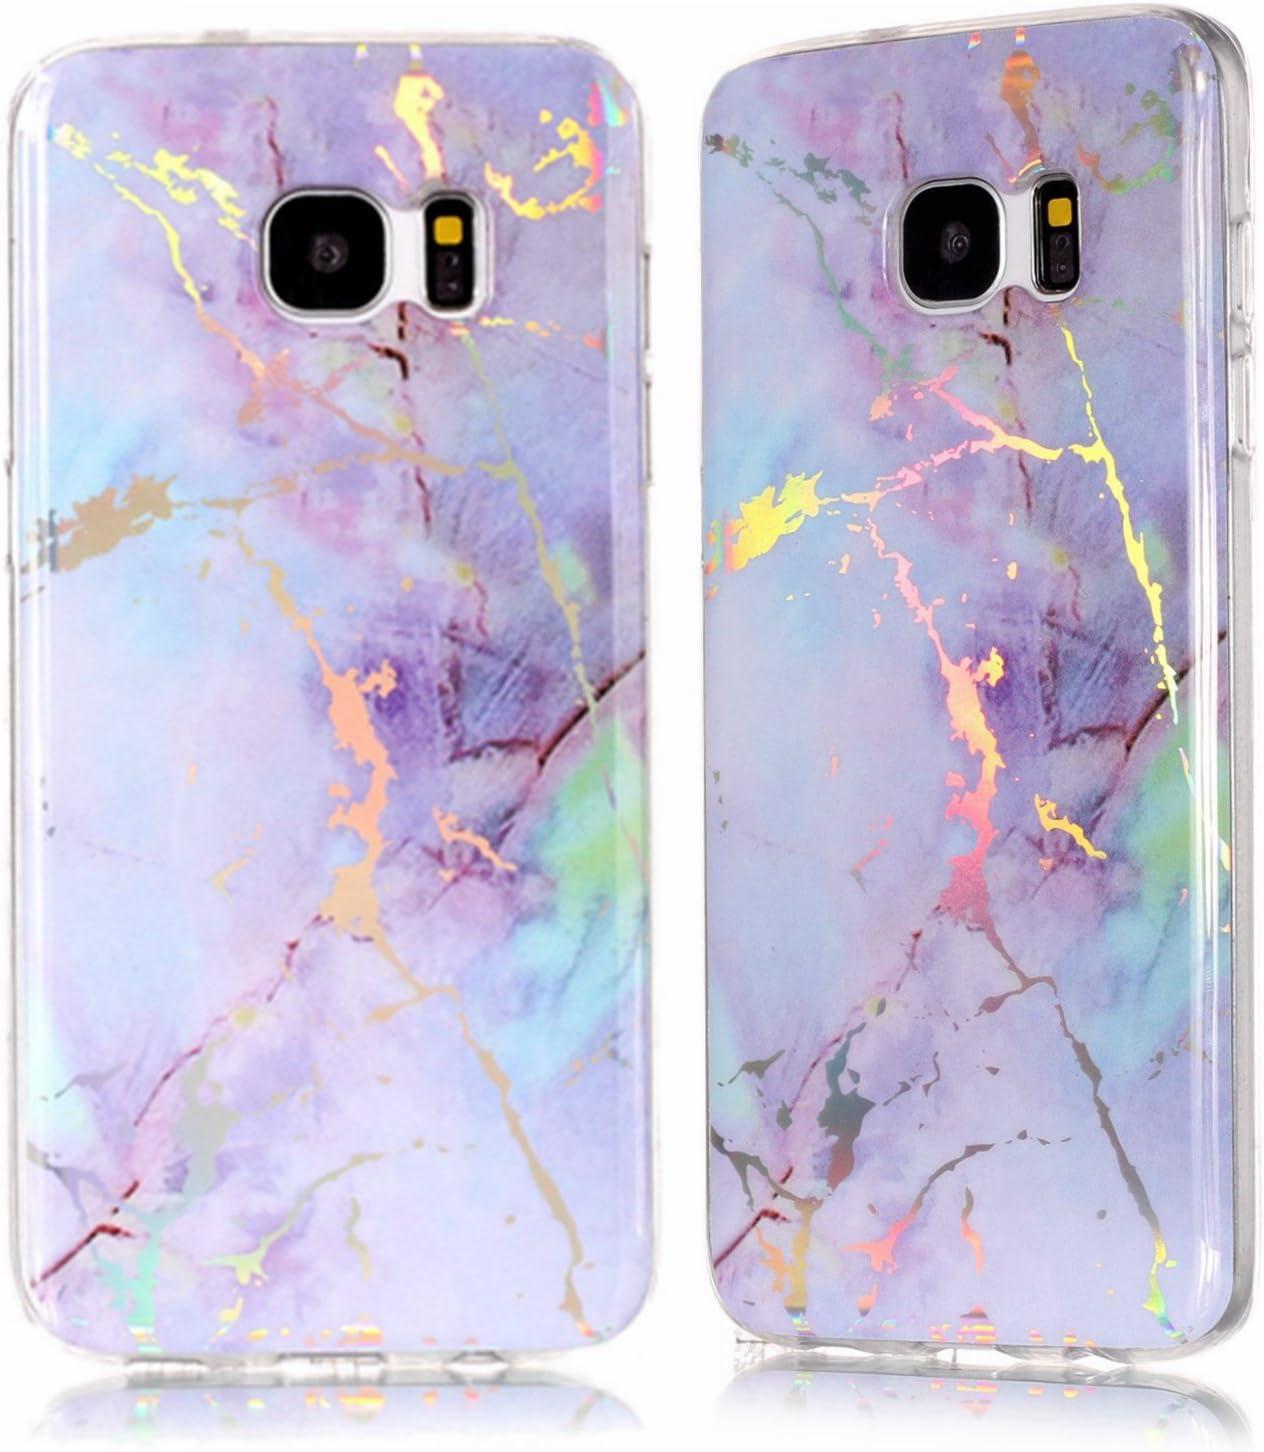 DAMONDY Galaxy S7 Edge Case,3D Shiny Marble Glitter Ultra Thin Slim Back Skin Full Body Protective Soft TPU Rubber Bumper Case Phone Cover for Samsung Galaxy S7 Edge-Pink Purple